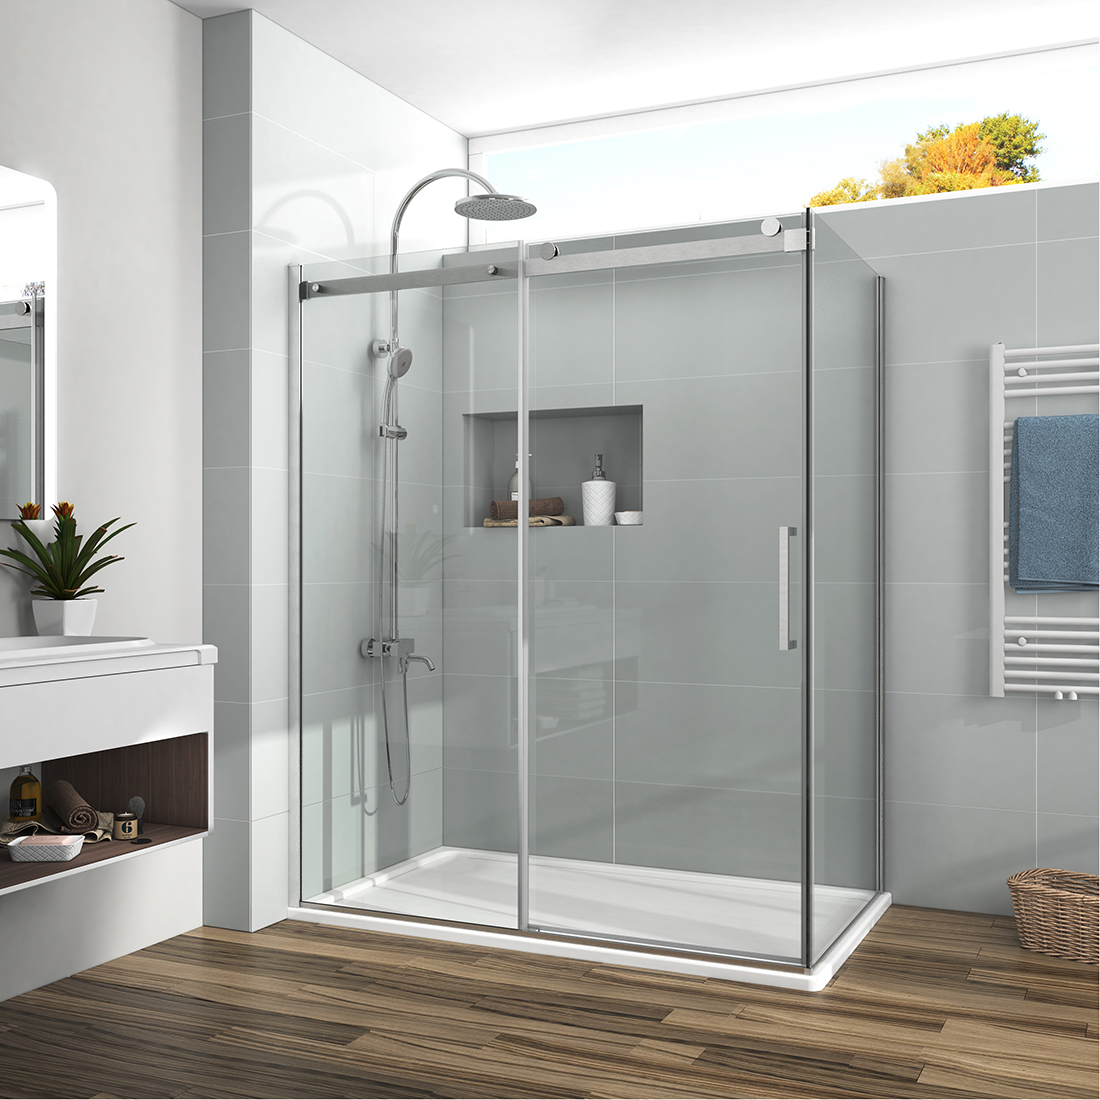 Details About 48 X36 X72 Frameless Sliding Shower Door Enclosure Side Panel 5 16 Glass